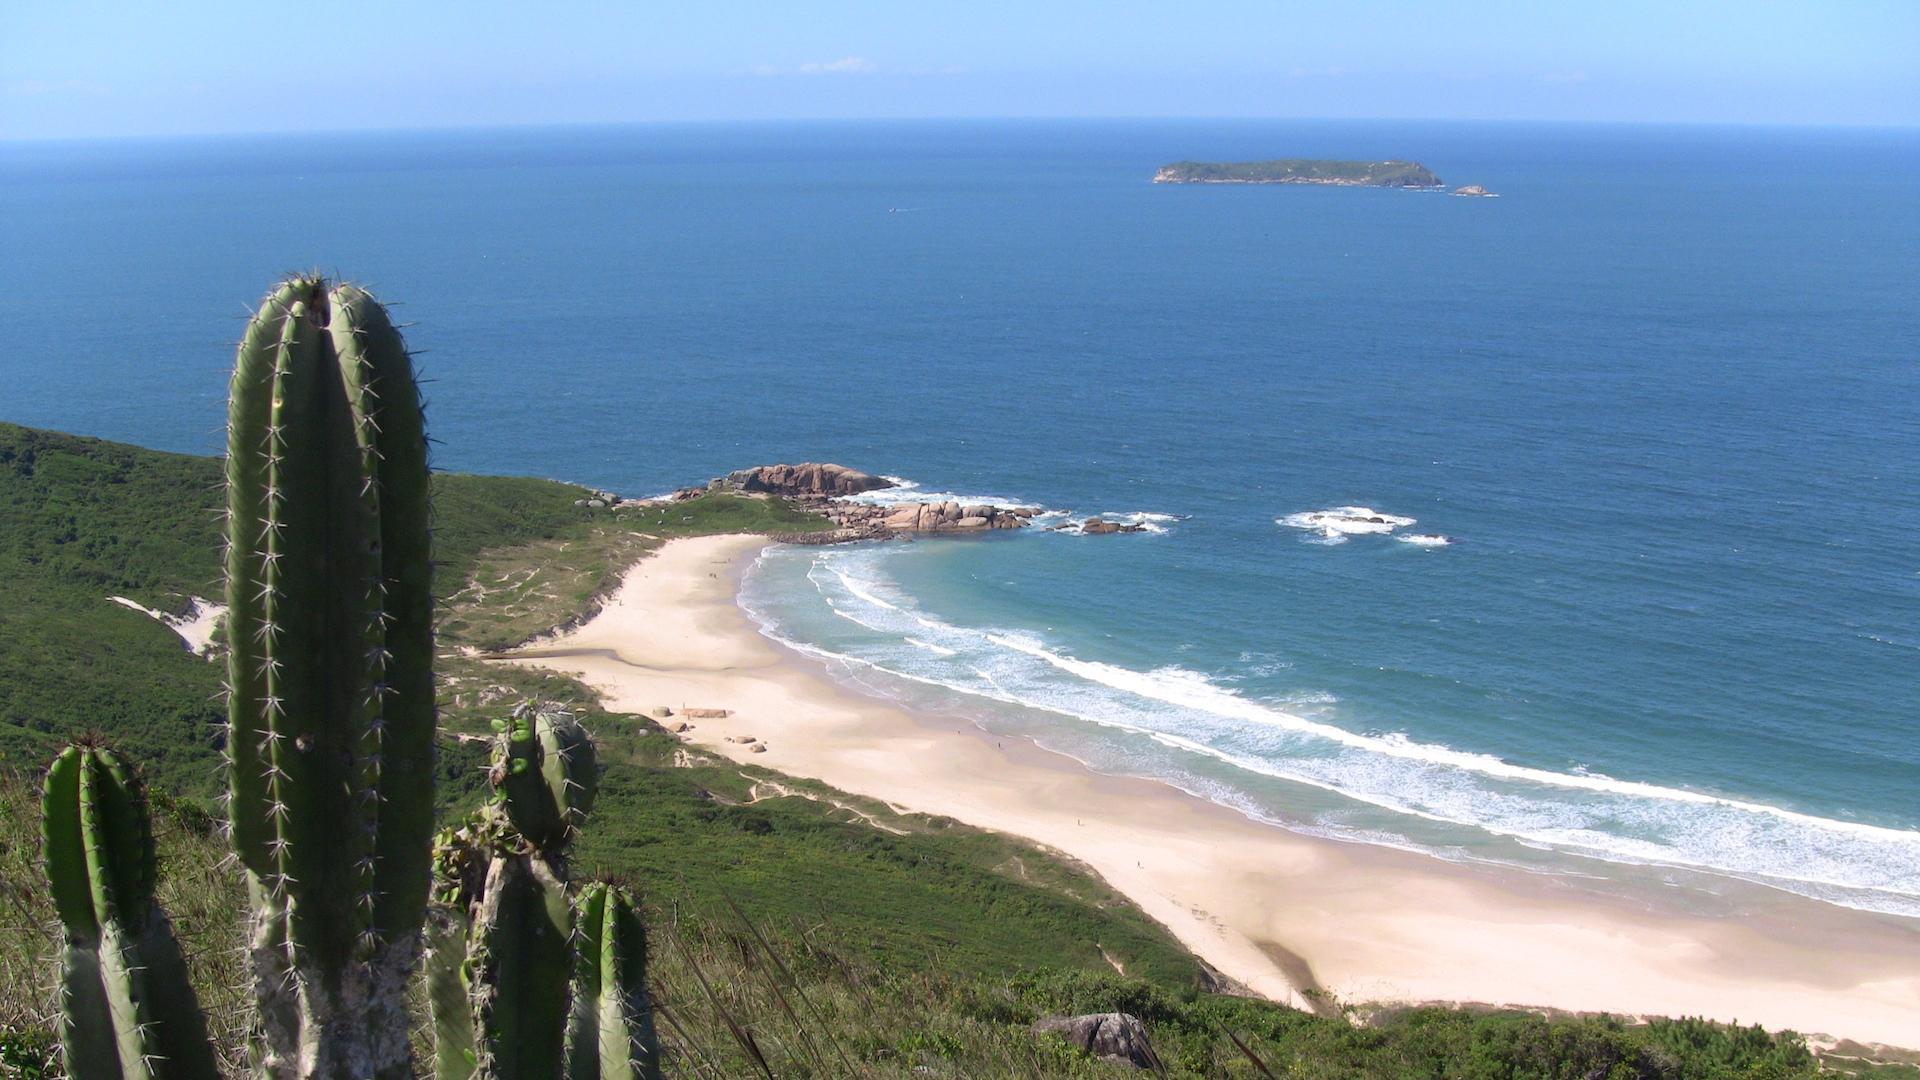 Lagoinha do Leste Florianopolis Brazil